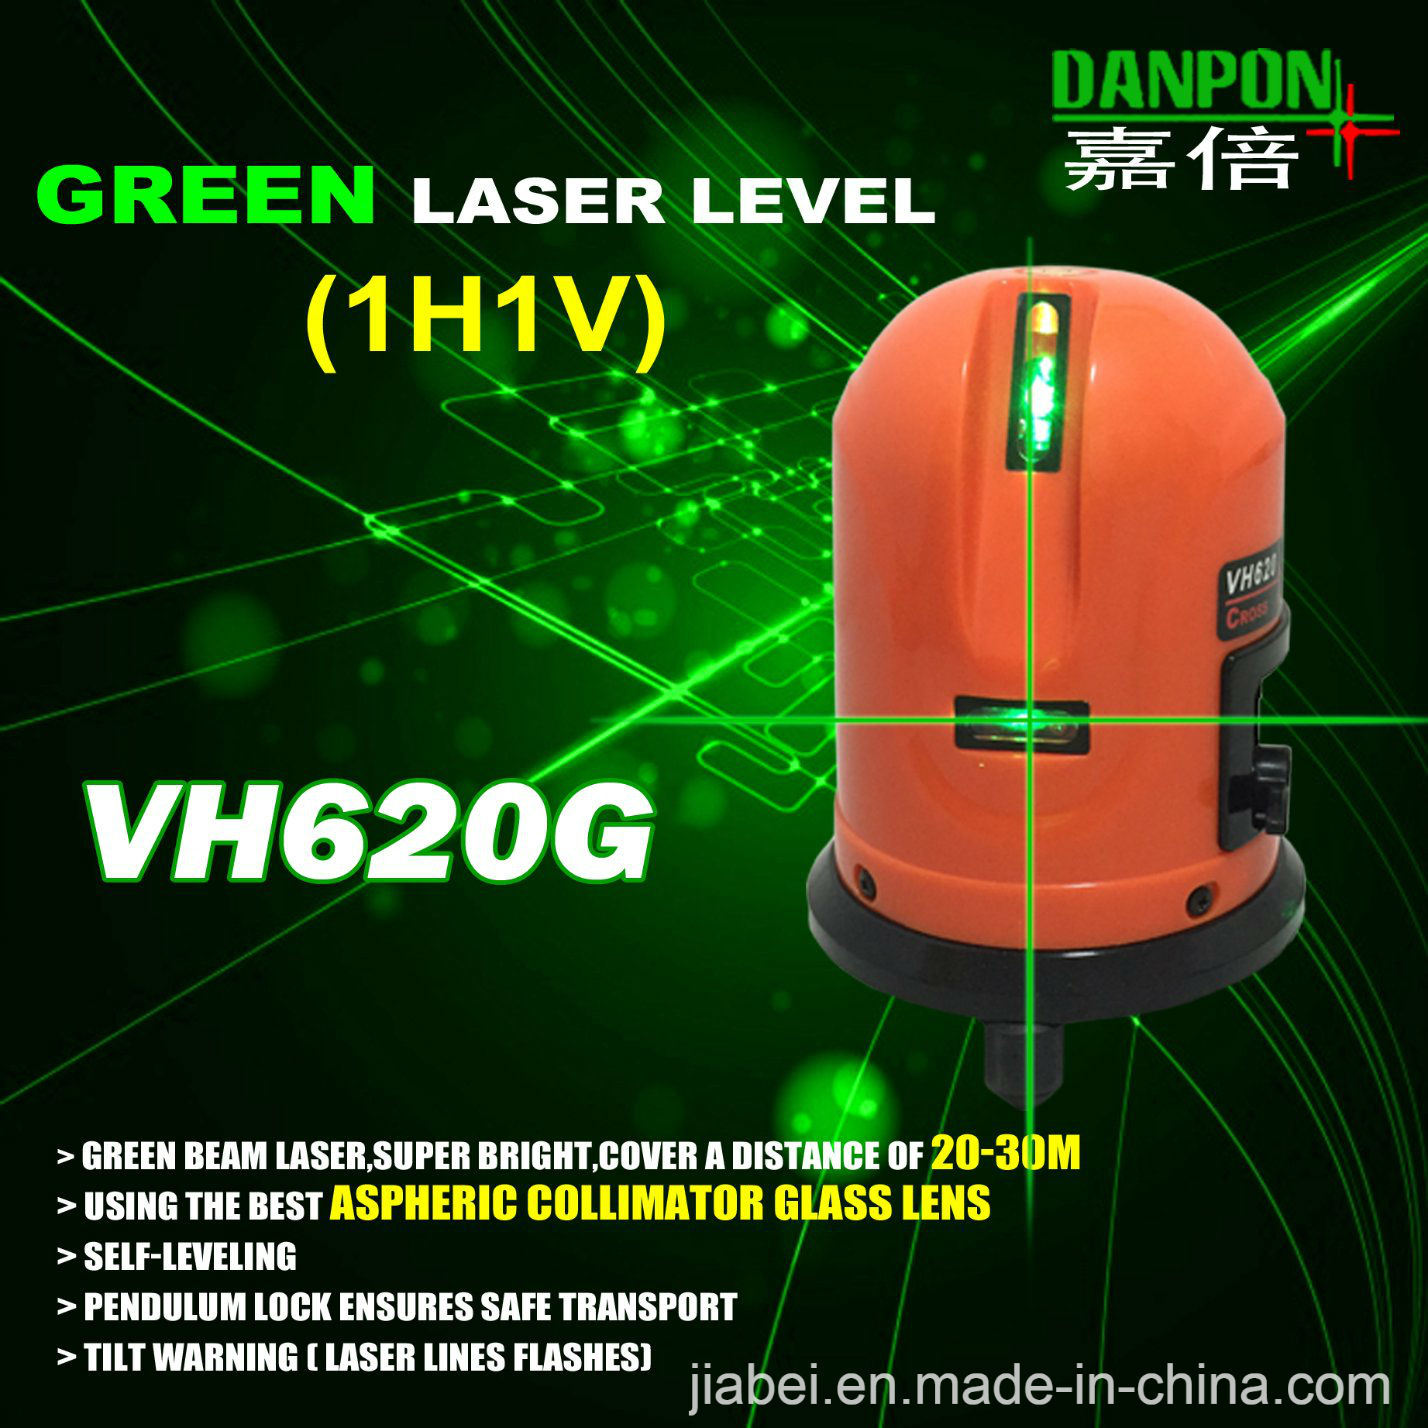 Danpon Laser Level Tool Laser Liner Vh620g Green Beam